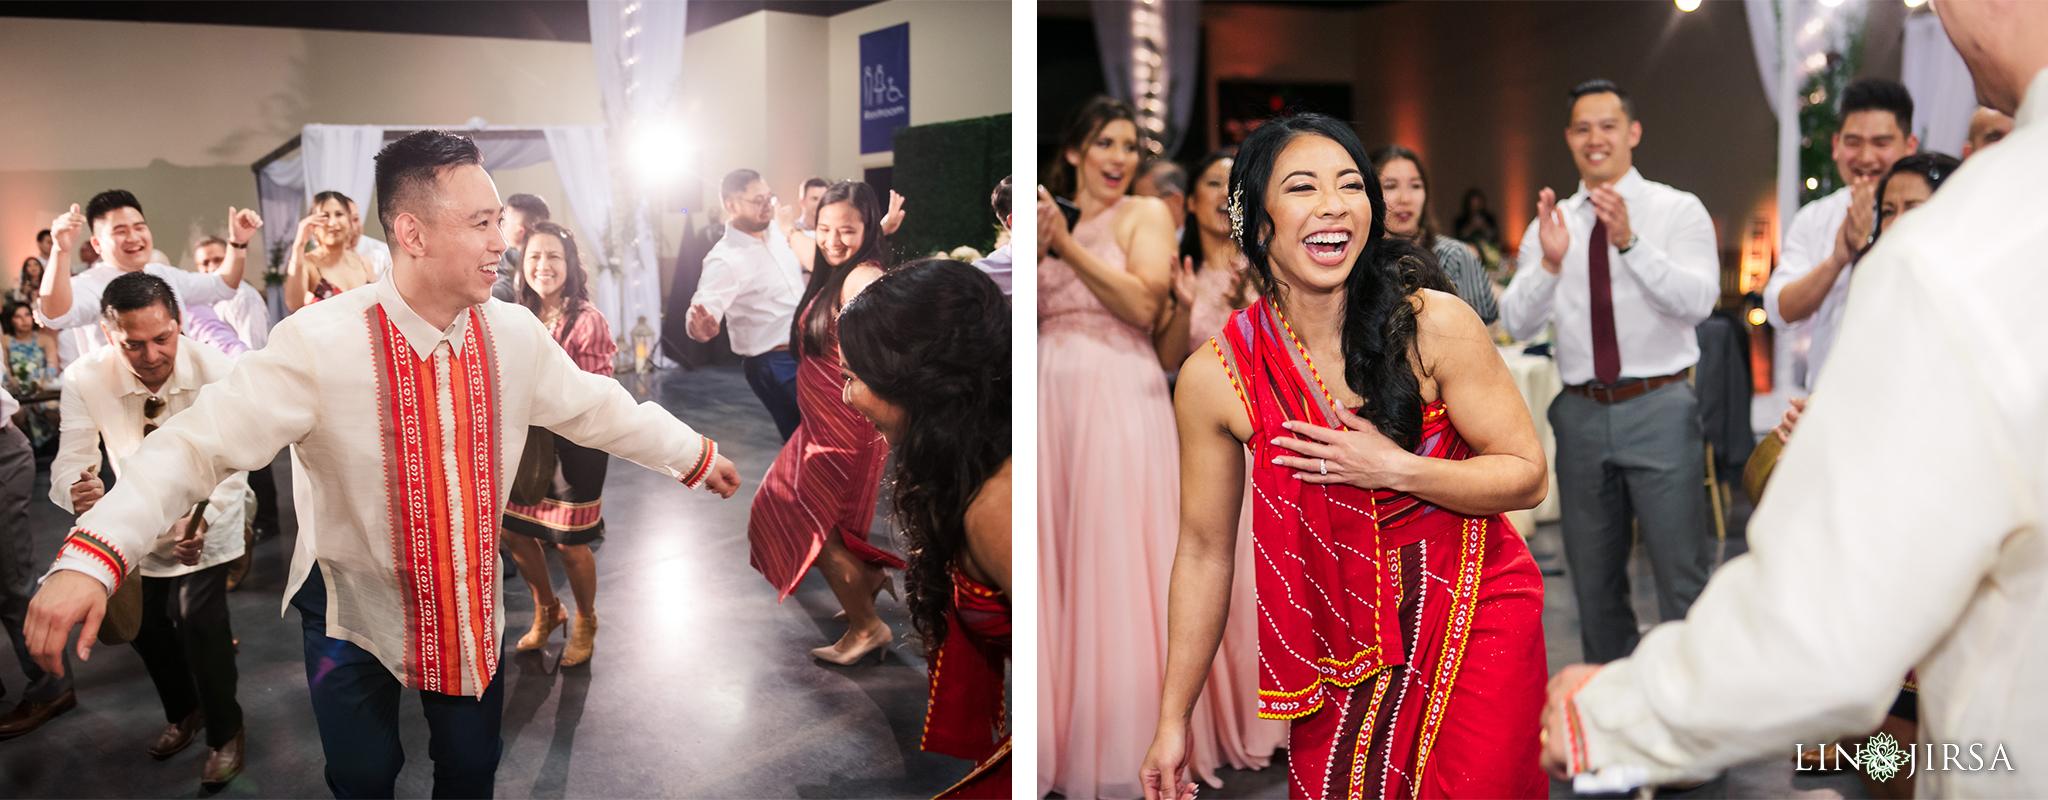 39 Business Expo Center Orange County Korean Filipino Wedding Photography